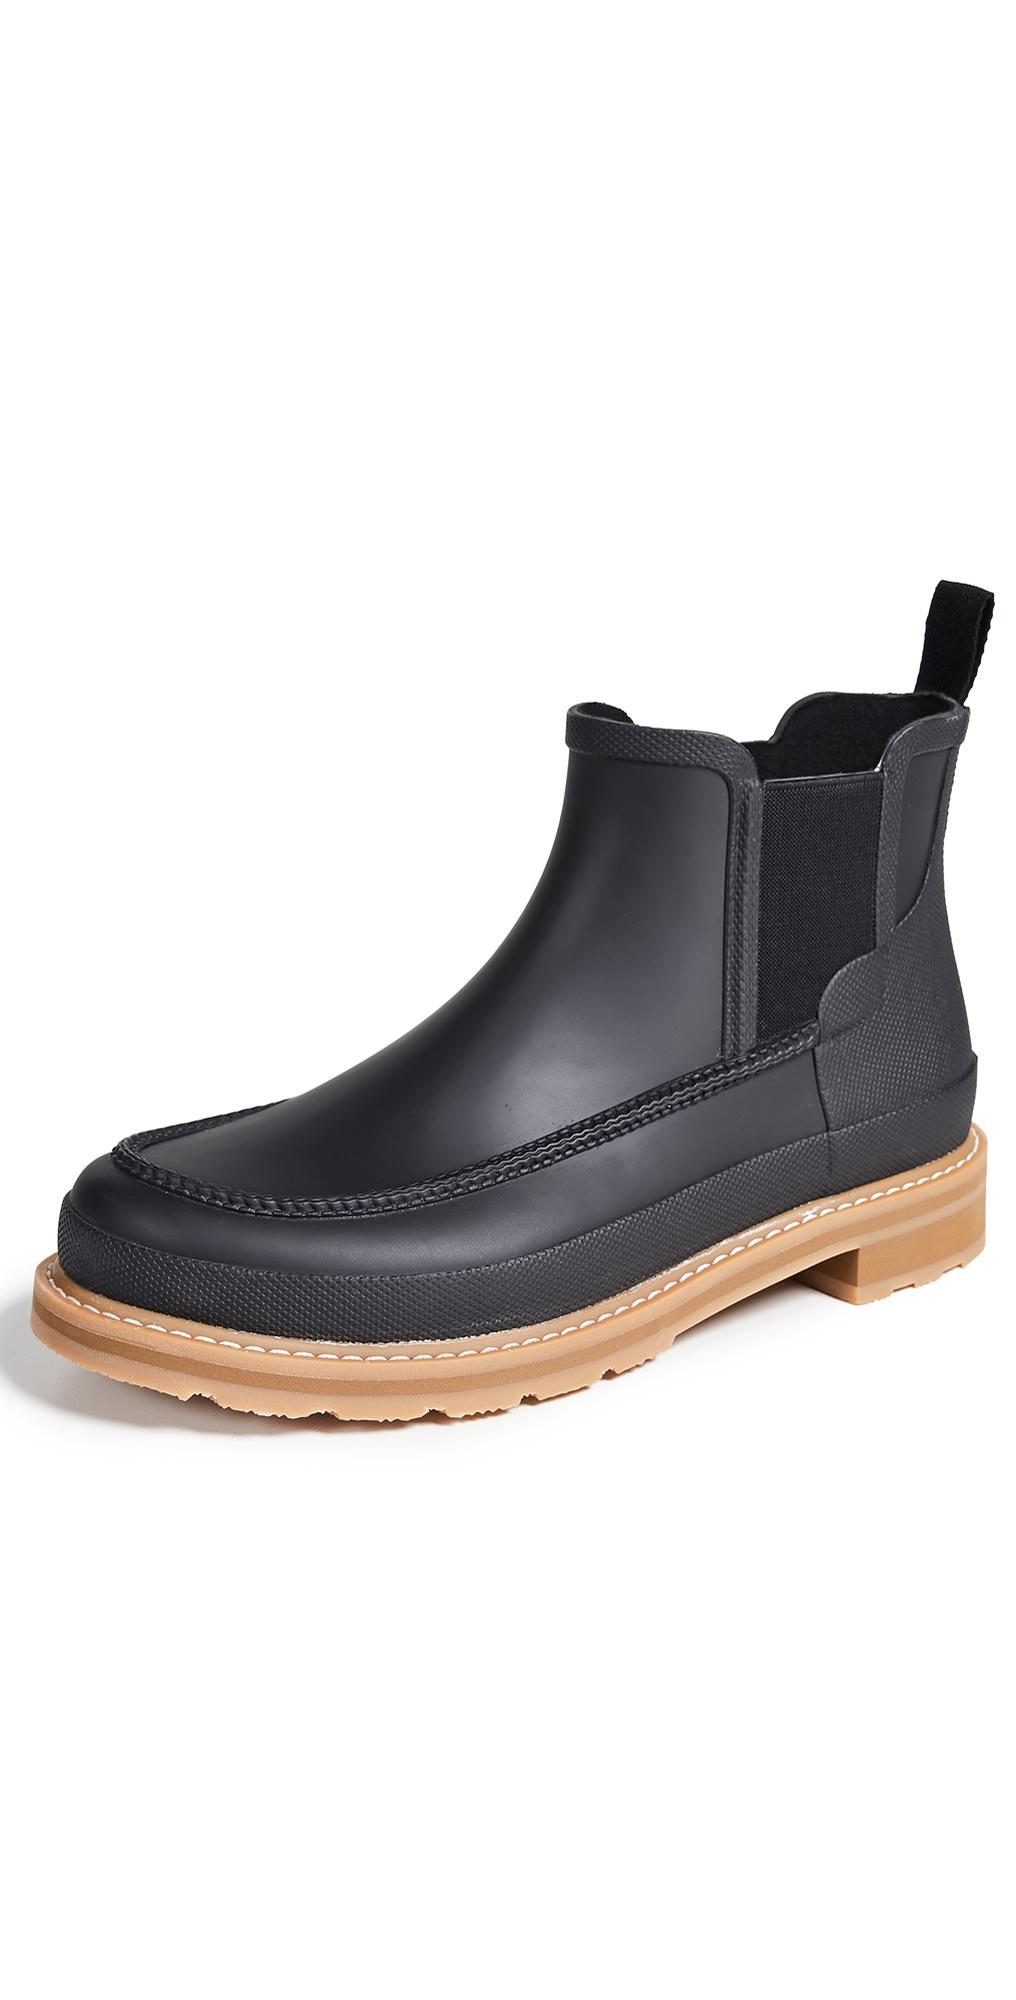 Lightweight Mocc Toe Short Boots